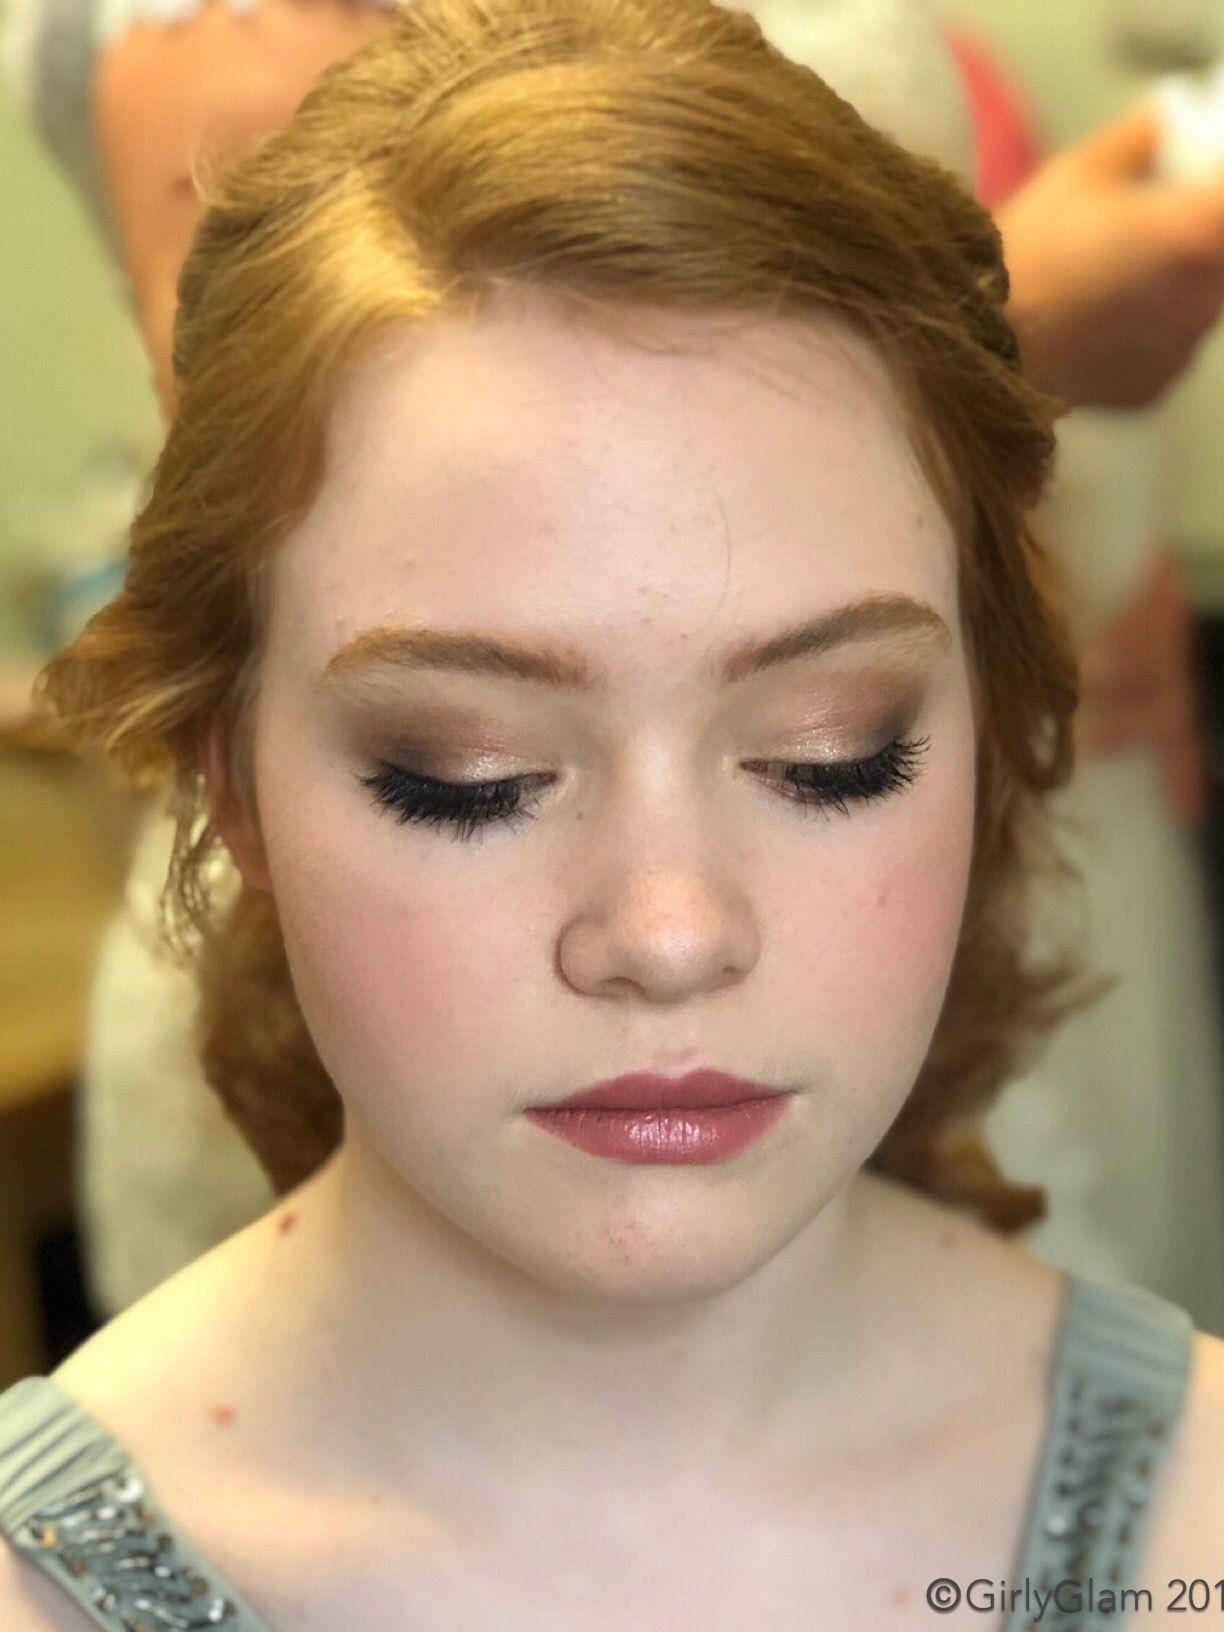 Professional Norfolk Based Makeup Artists www.girlyglam.co